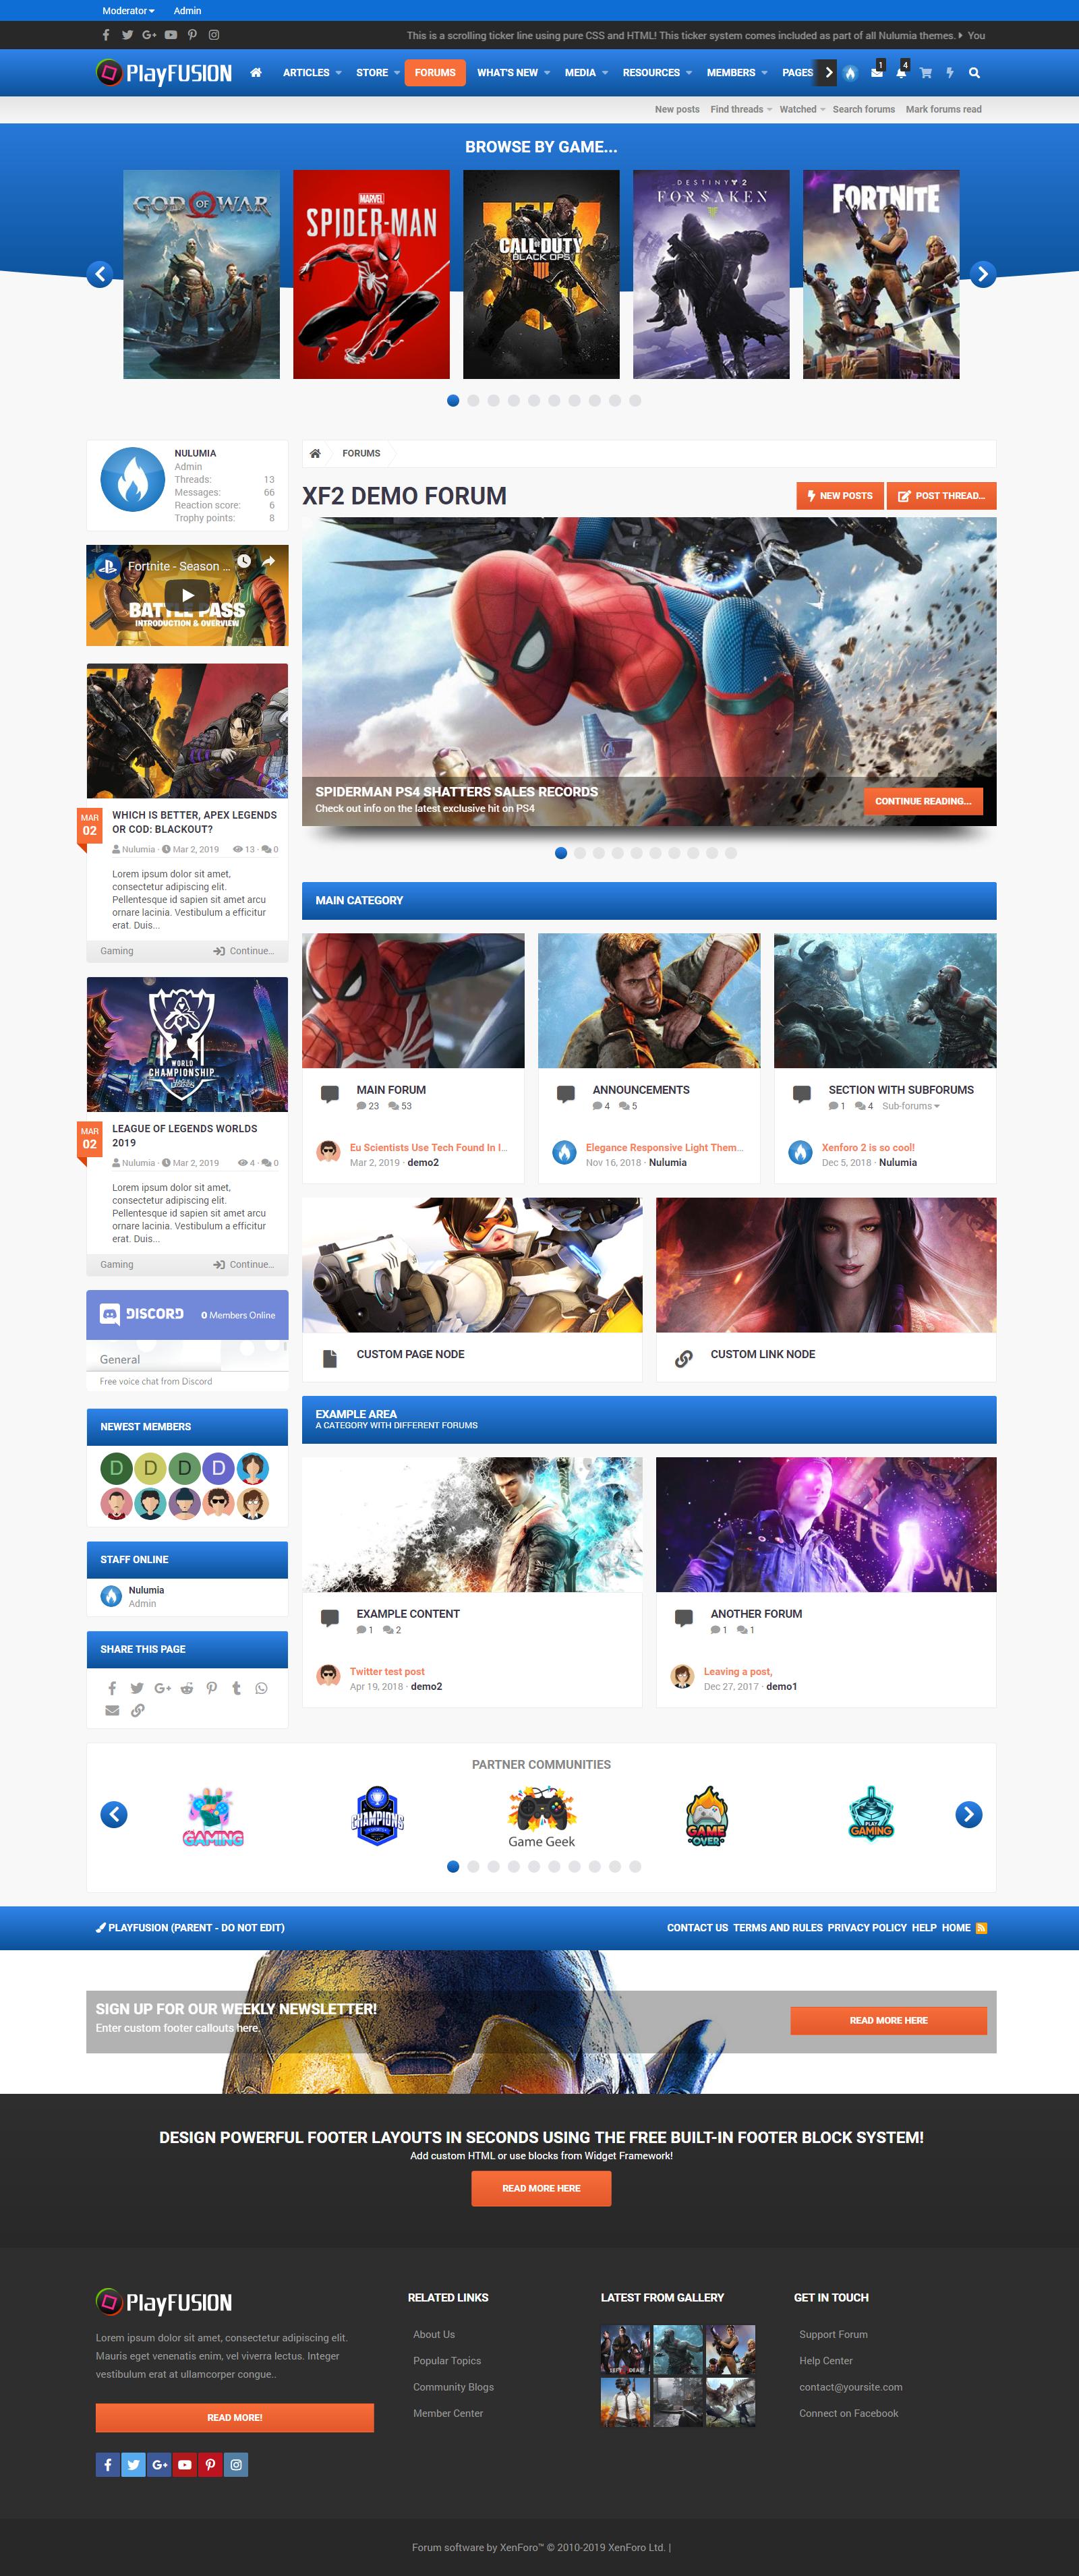 PlayFusion - Gaming Community Xenforo 2 Style | Xenforo Forum Gaming